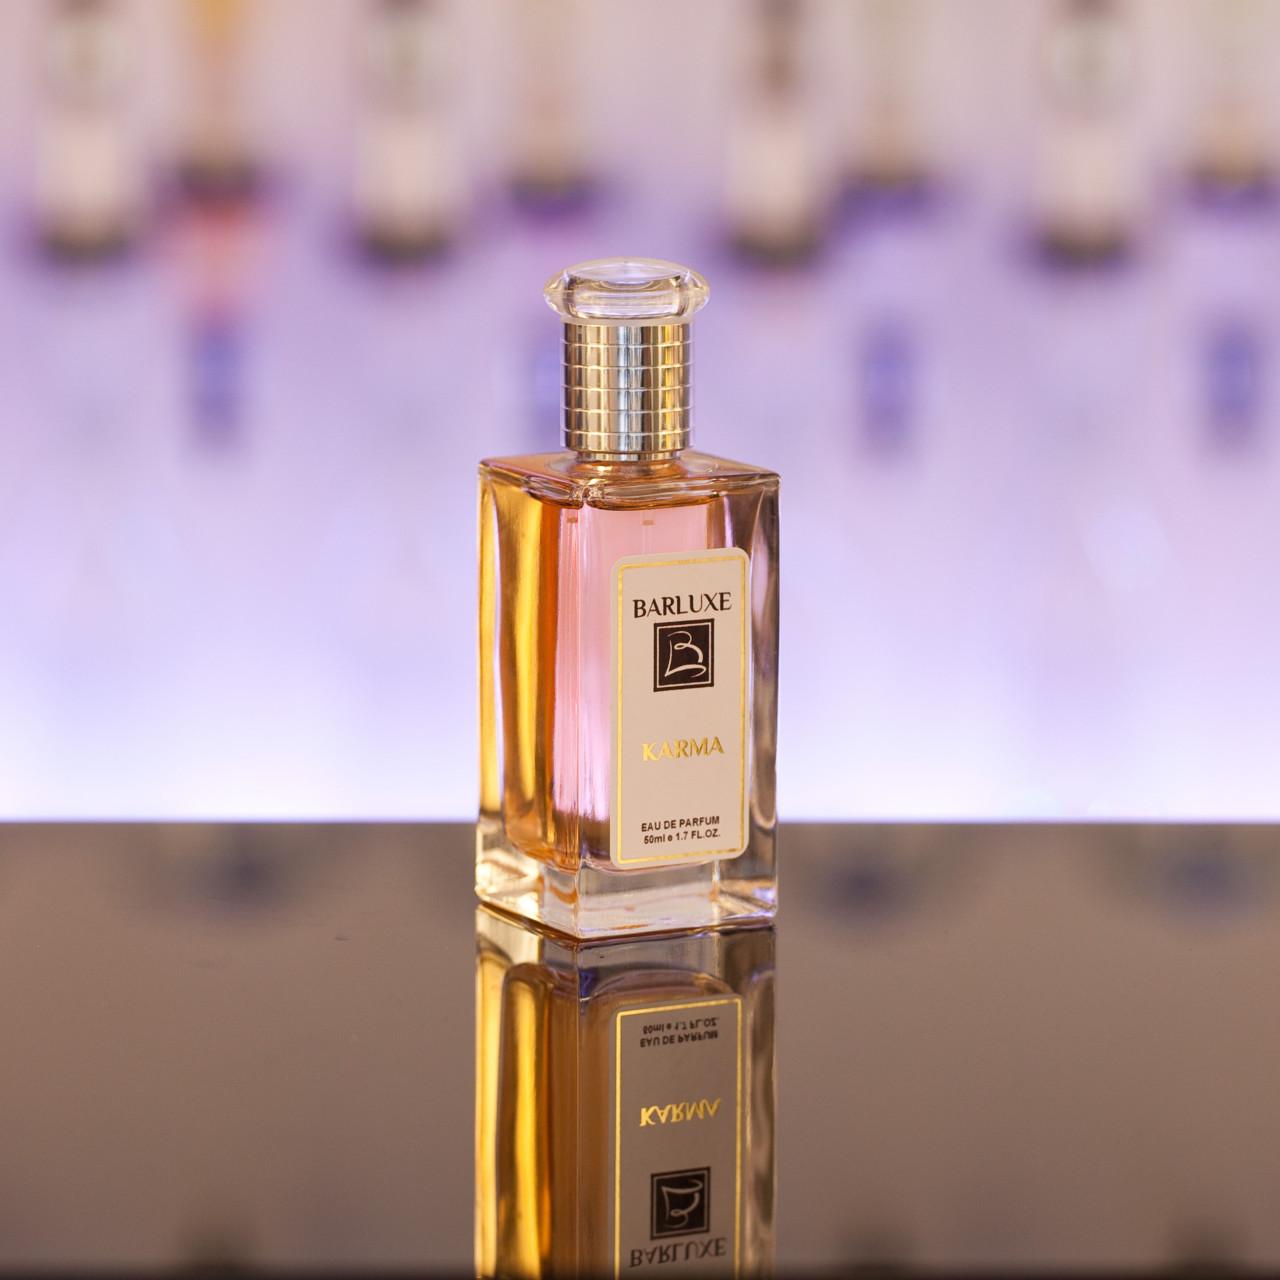 damen-parfum-dupe-double-duft-duftzwilling-karma-2